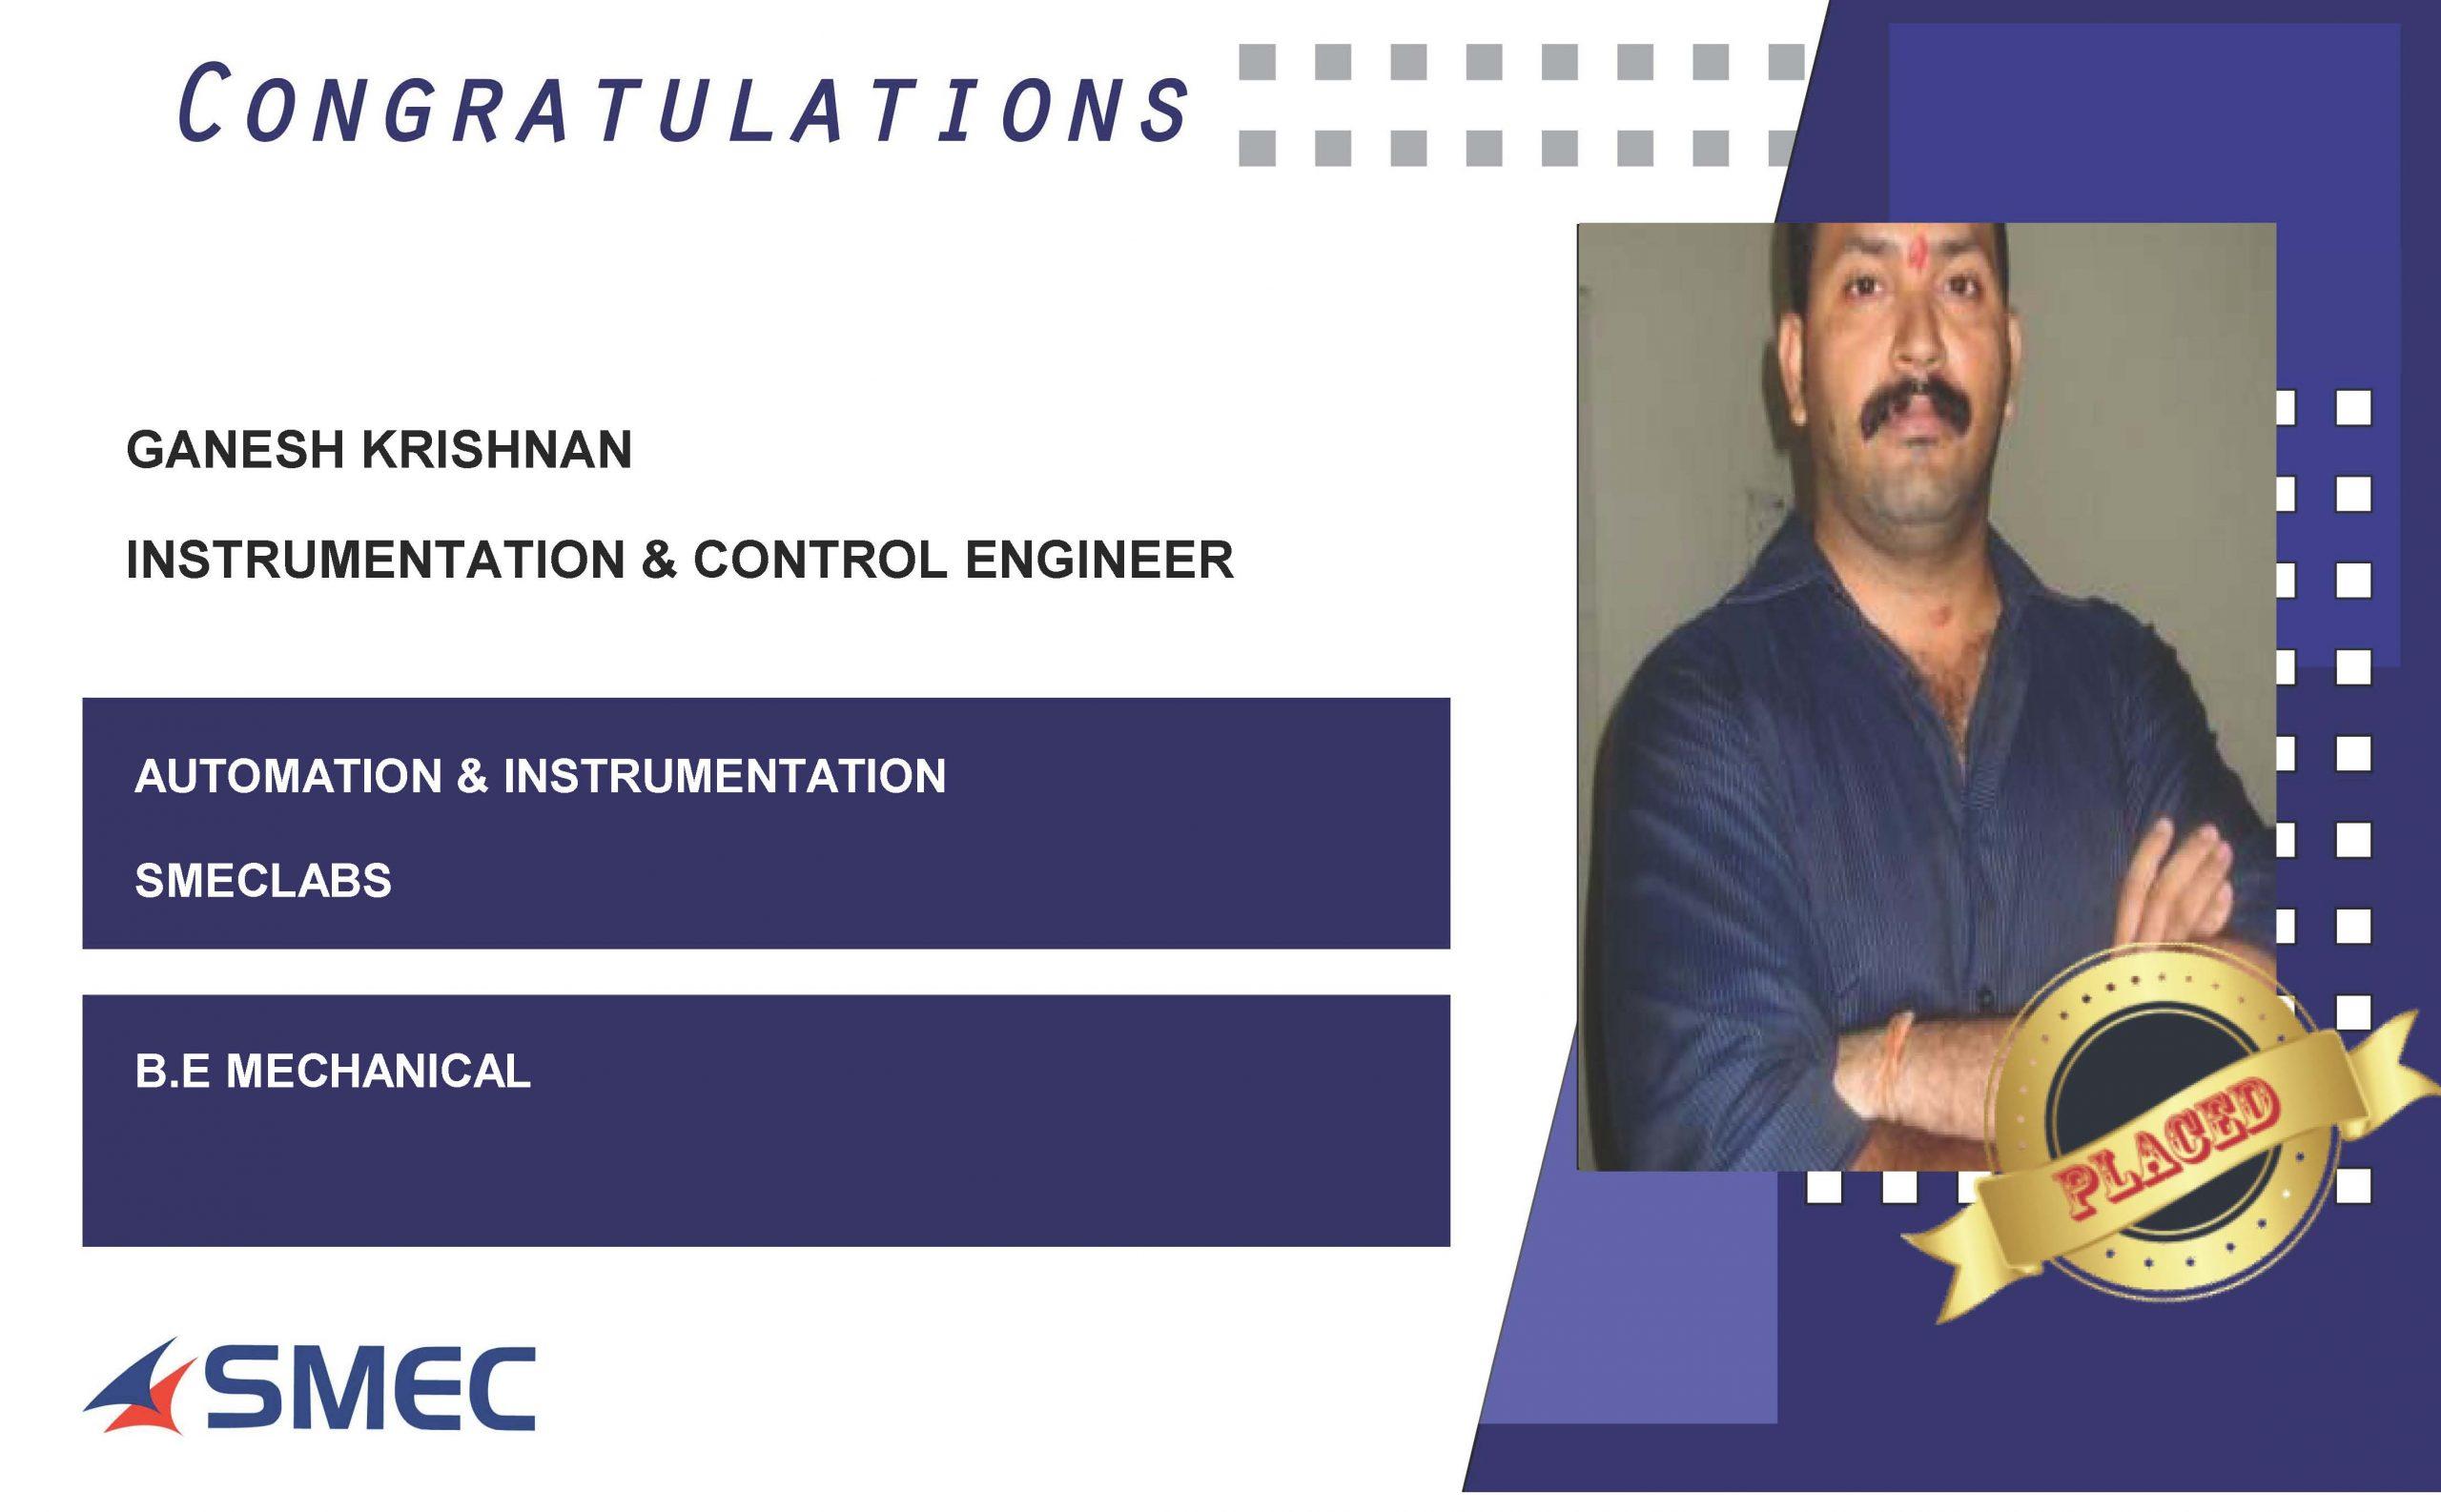 Instrumentation & control engineer-ganesh krishnan